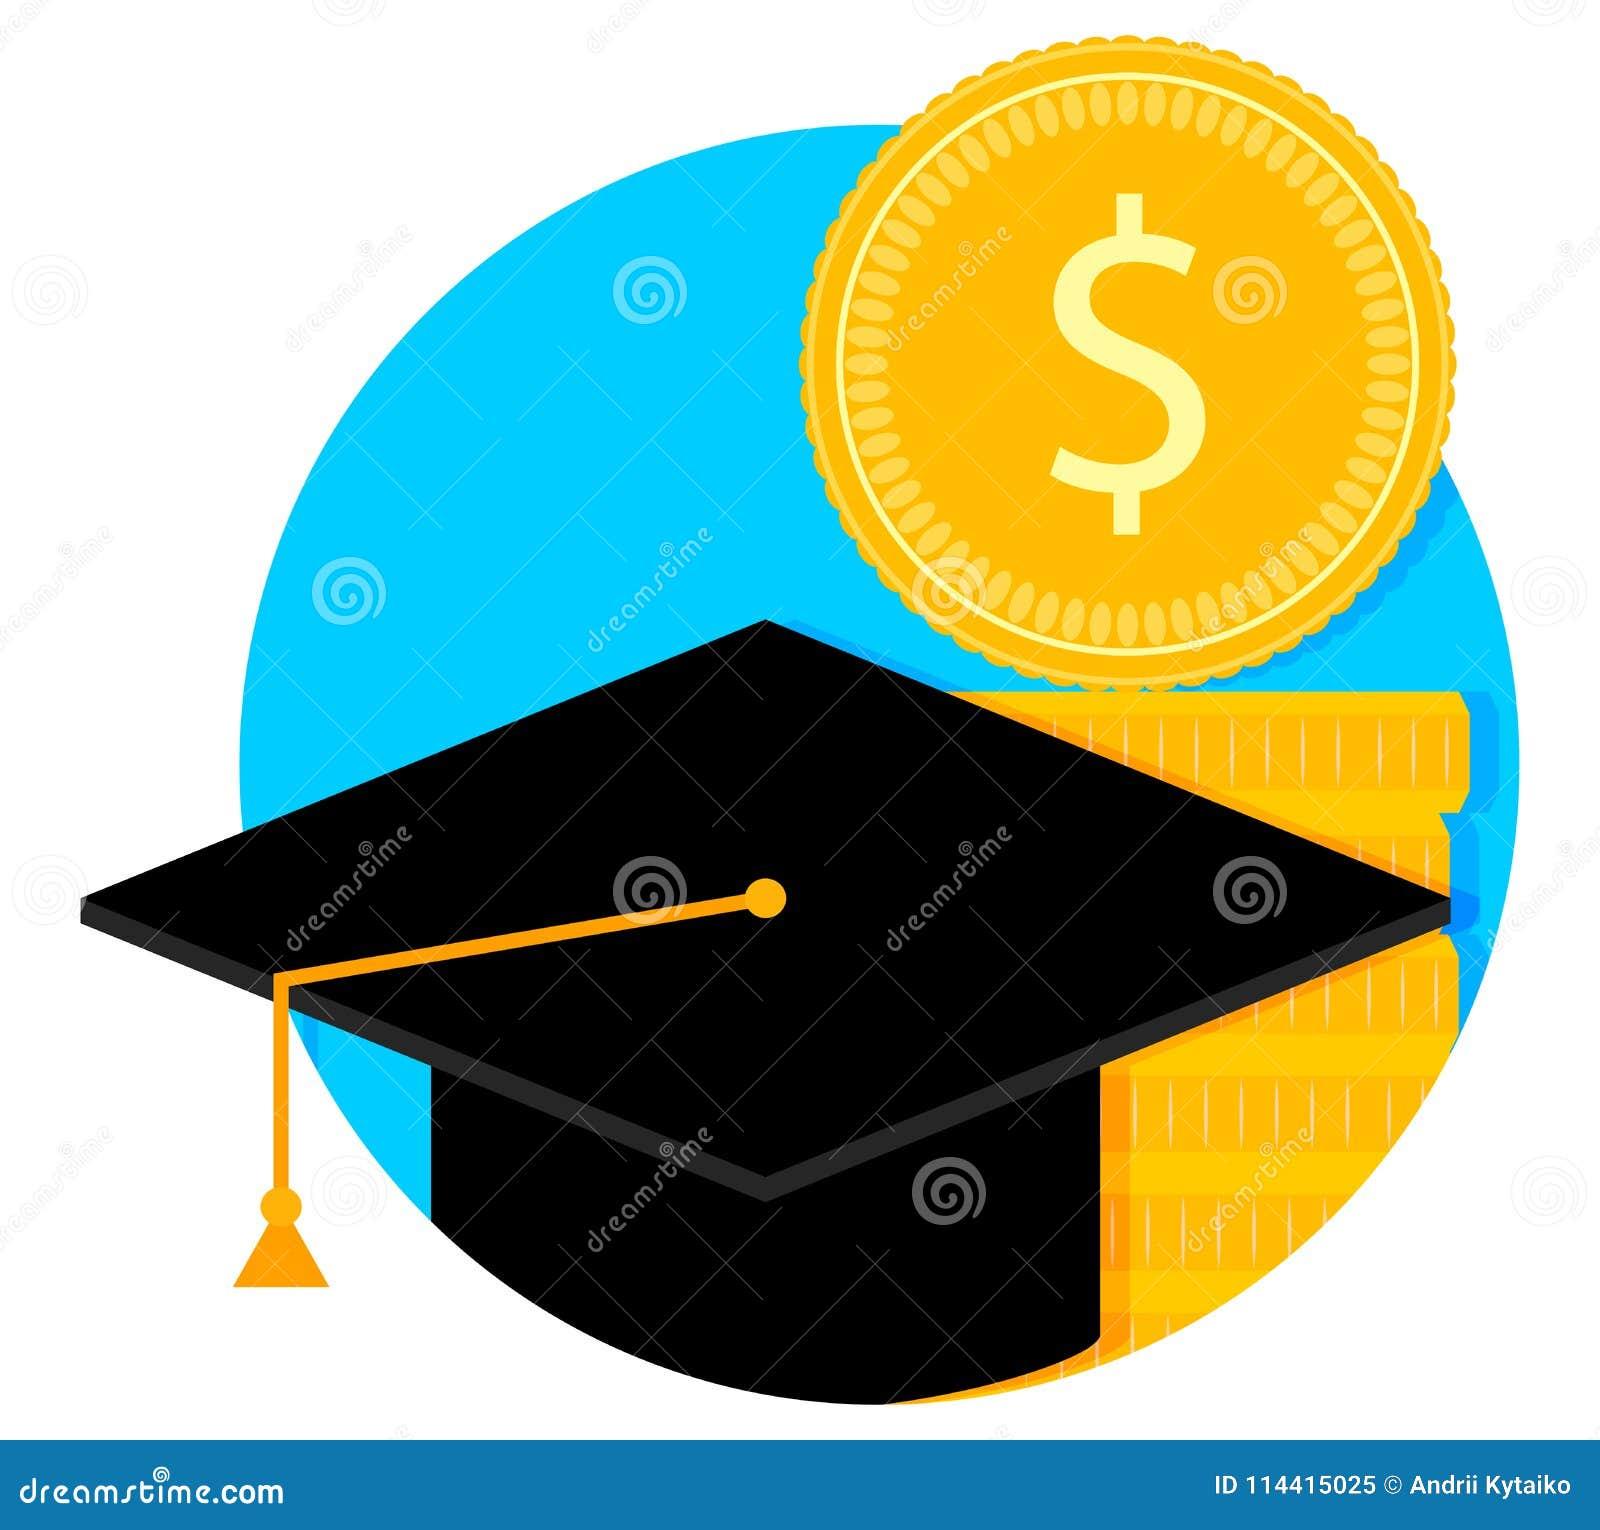 Awards clipart scholarship award, Awards scholarship award Transparent FREE  for download on WebStockReview 2020